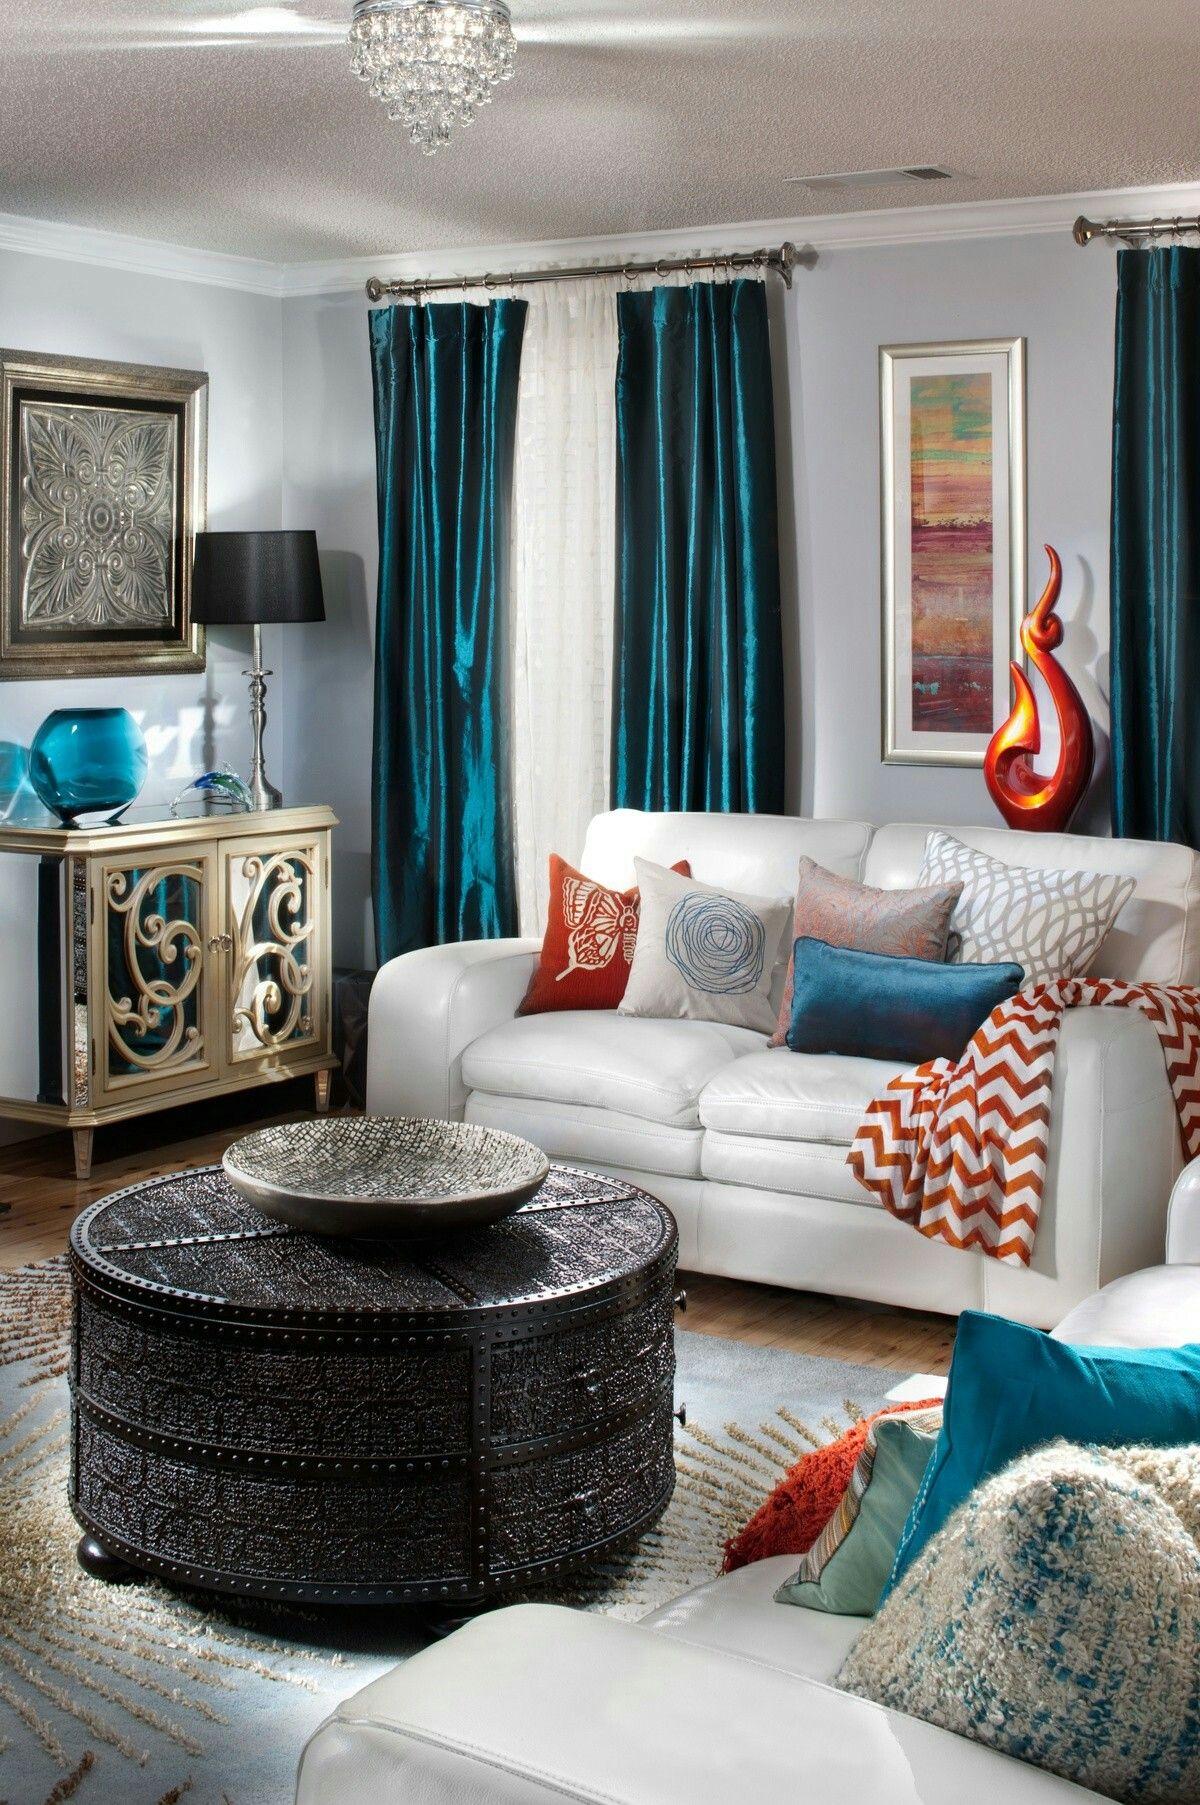 imagelenus sumanaru on home decorations  teal living